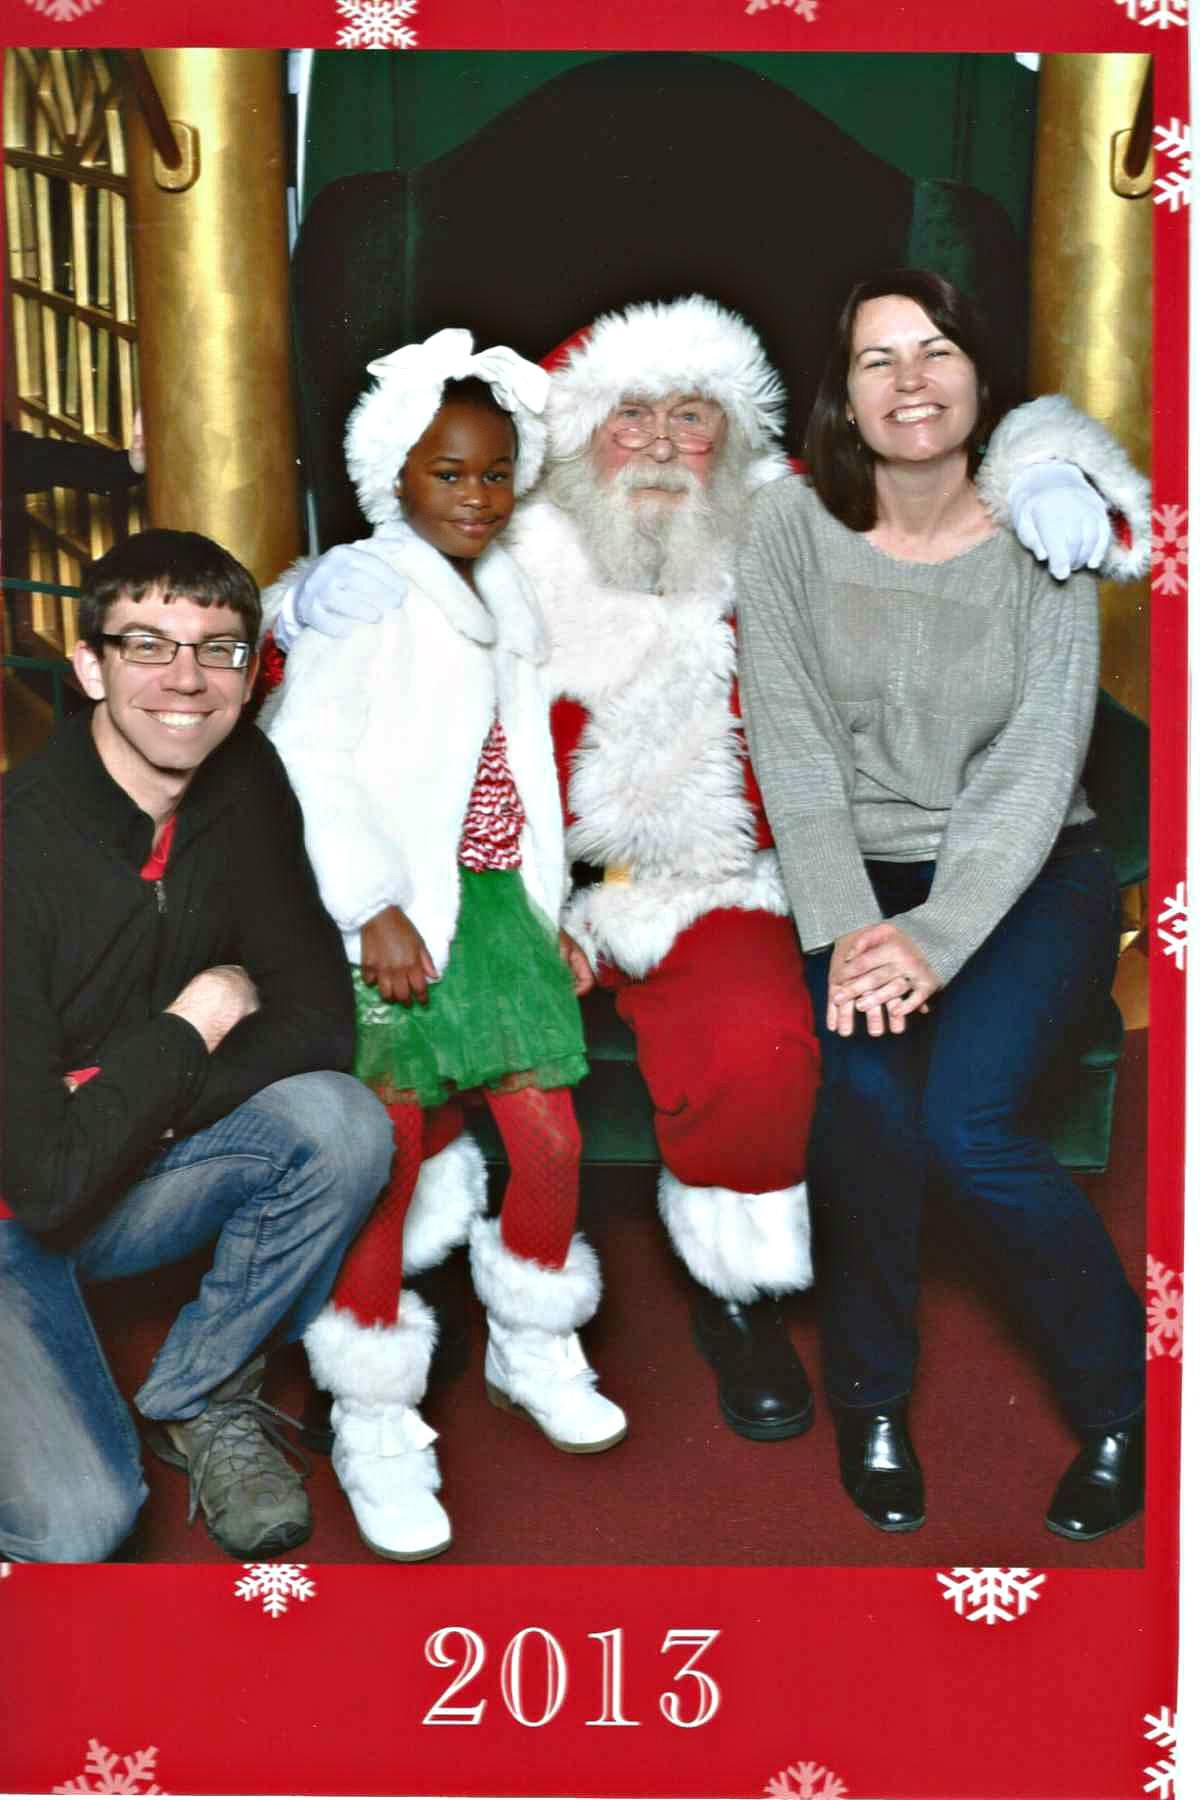 Visit to Santa 2013